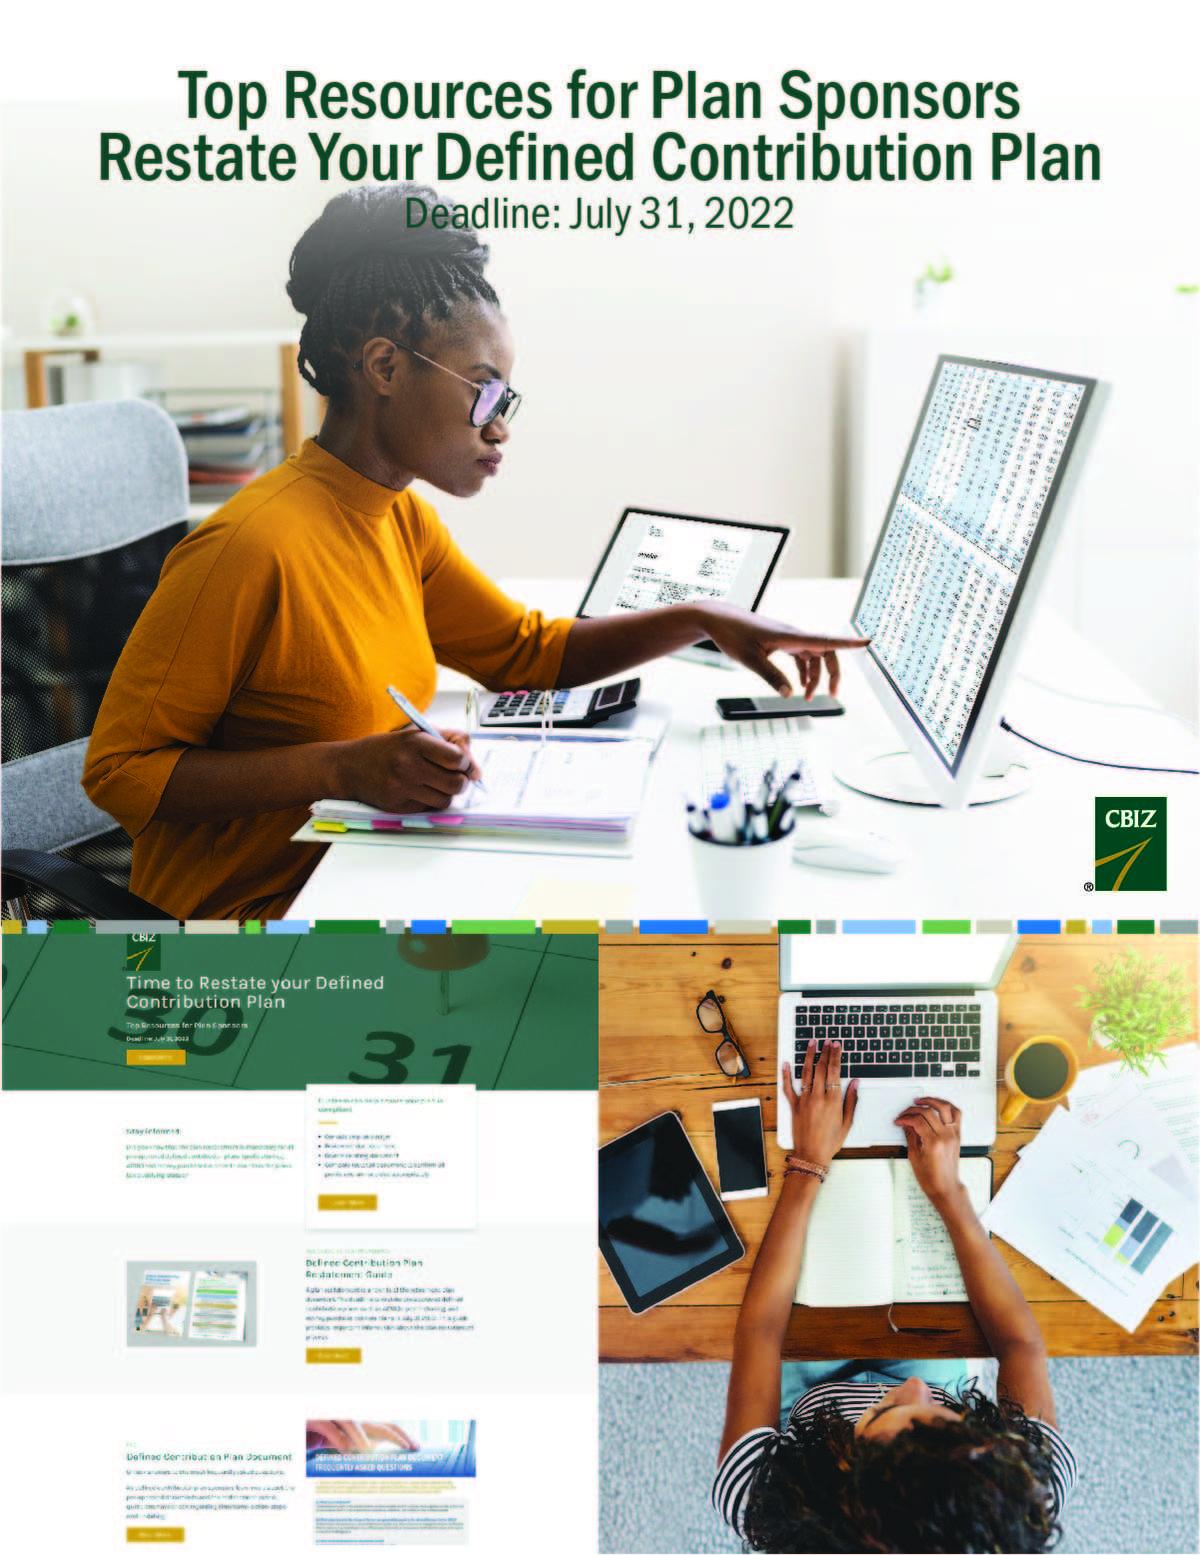 Defined Contribution Plan Restatement Resources